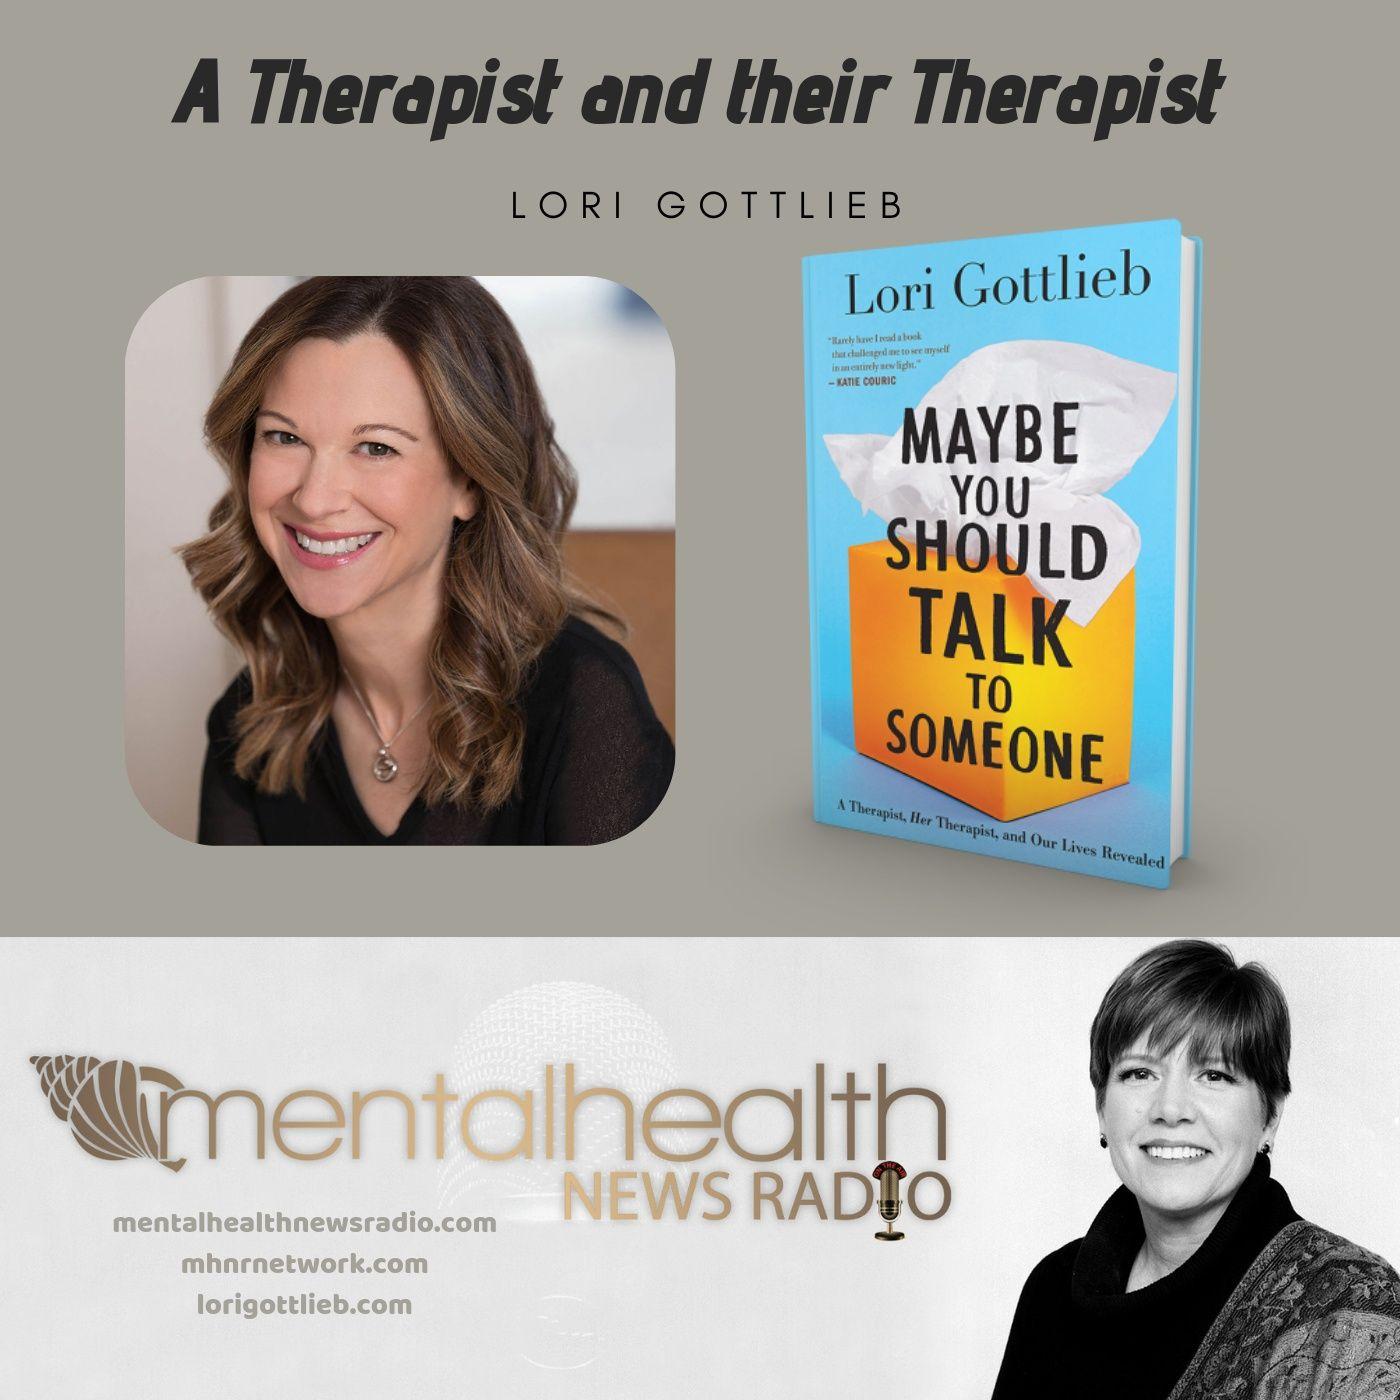 Mental Health News Radio - A Therapist and their Therapist: Lori Gottlieb